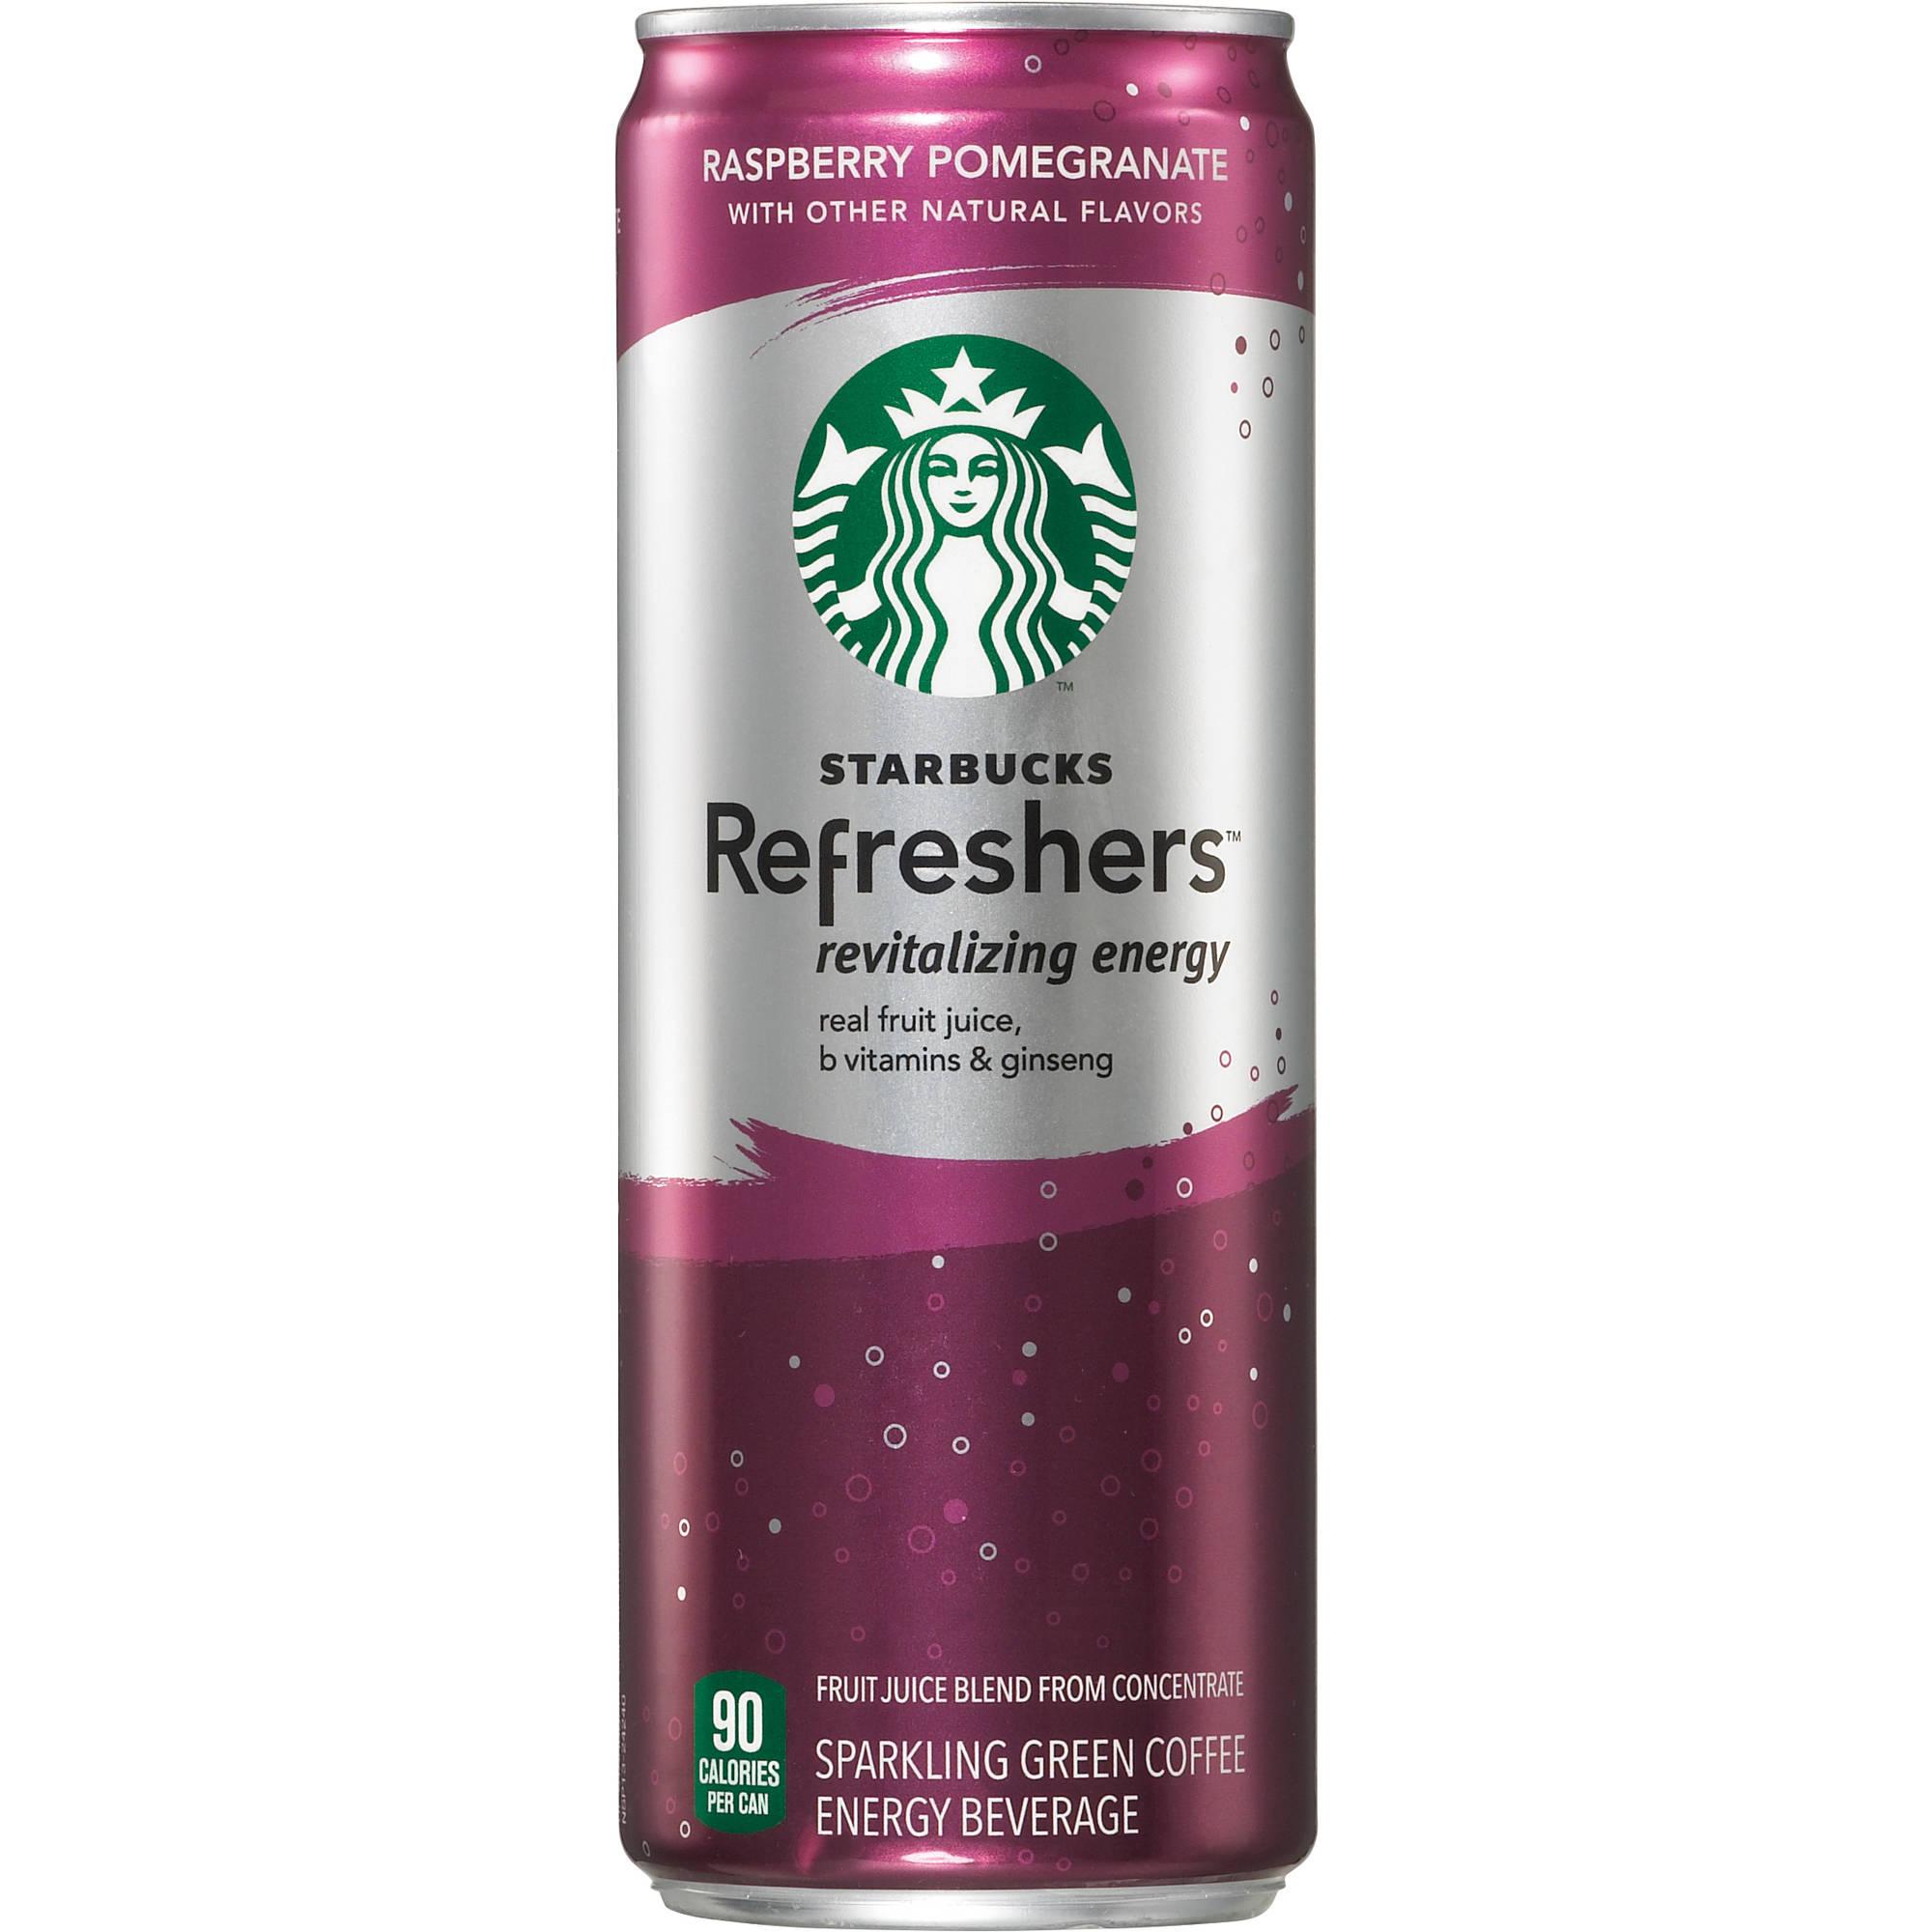 Starbucks Refreshers Raspberry Pomegranate Revitalizing Energy Drink, 12 fl oz